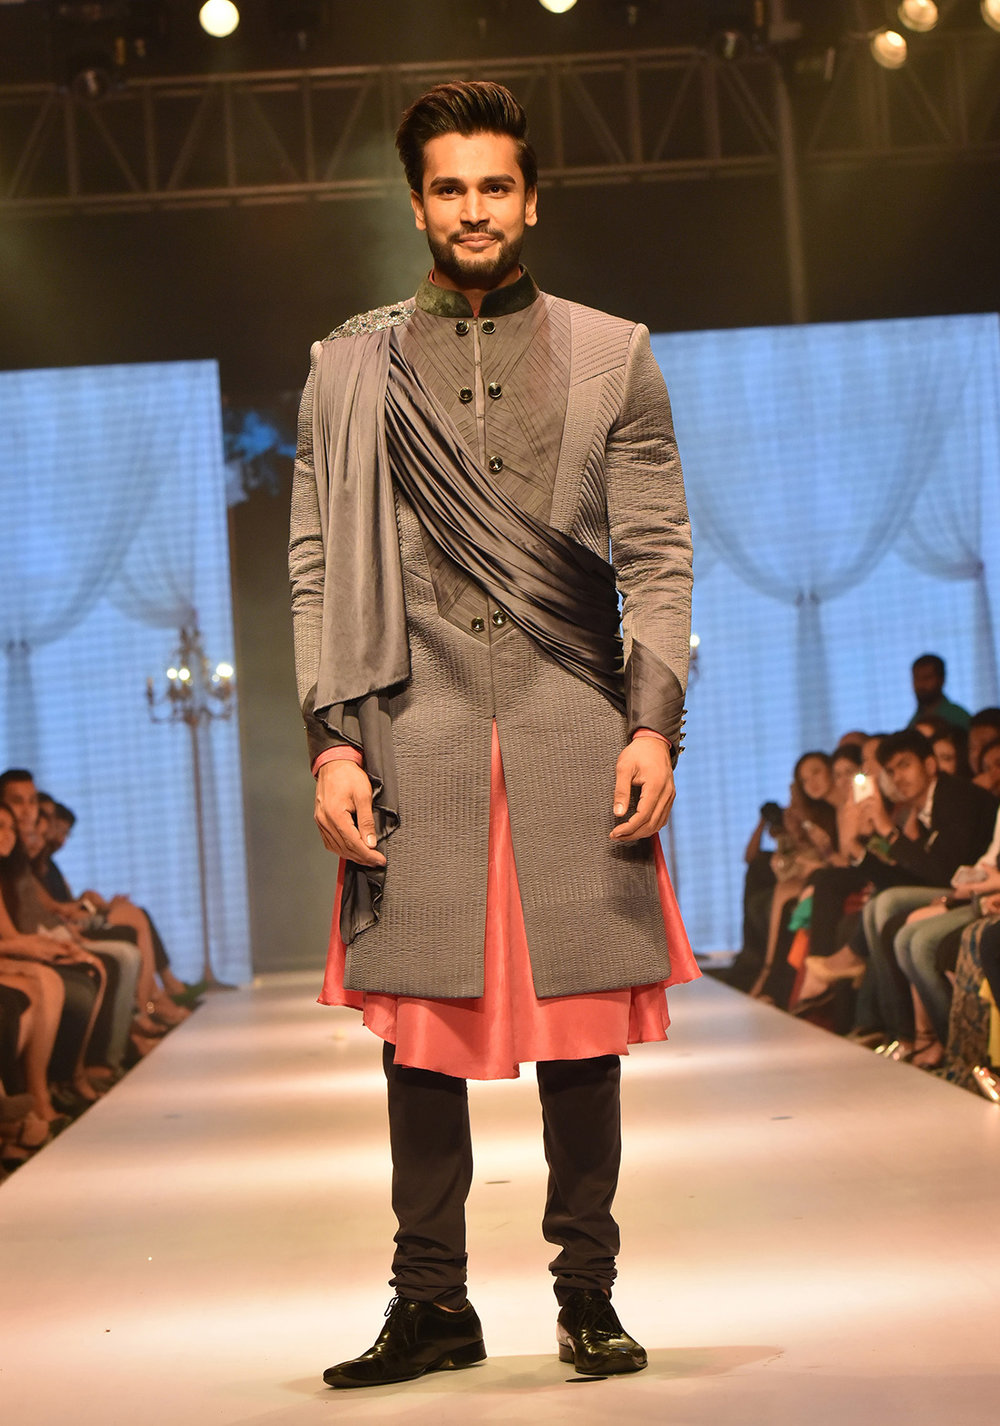 Showstopper Mr. World Rohit Khandelwal for Designer Nivedita Saboo's Grand Finale